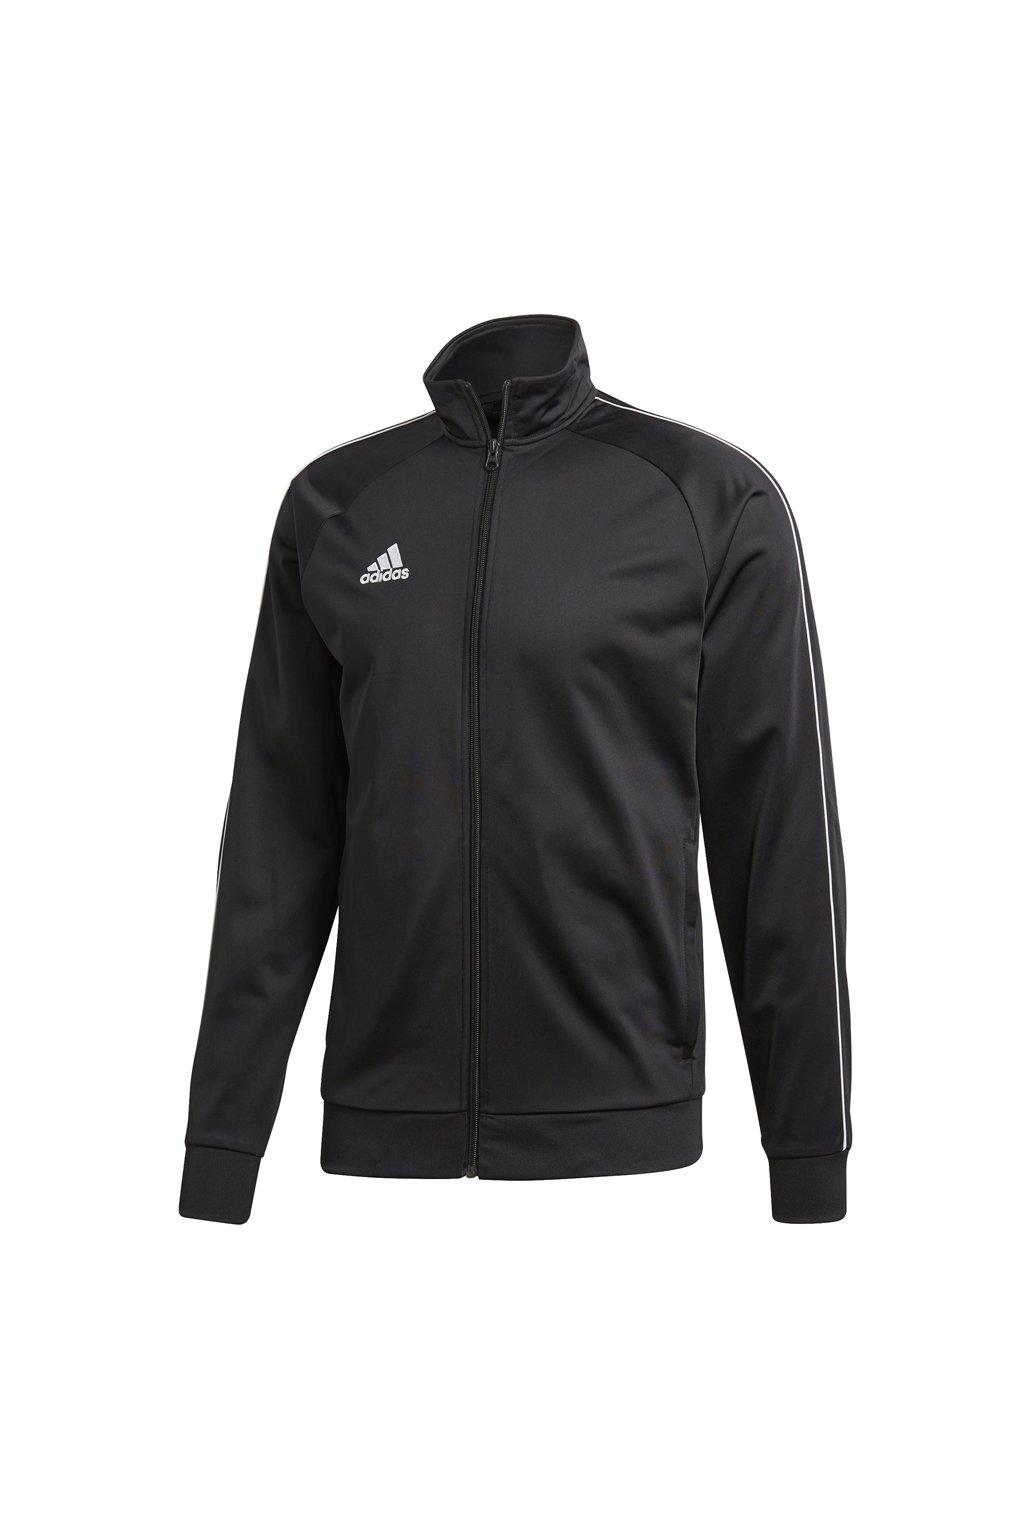 Pánska mikina Adidas Core 18 Polyester čierna CE9053